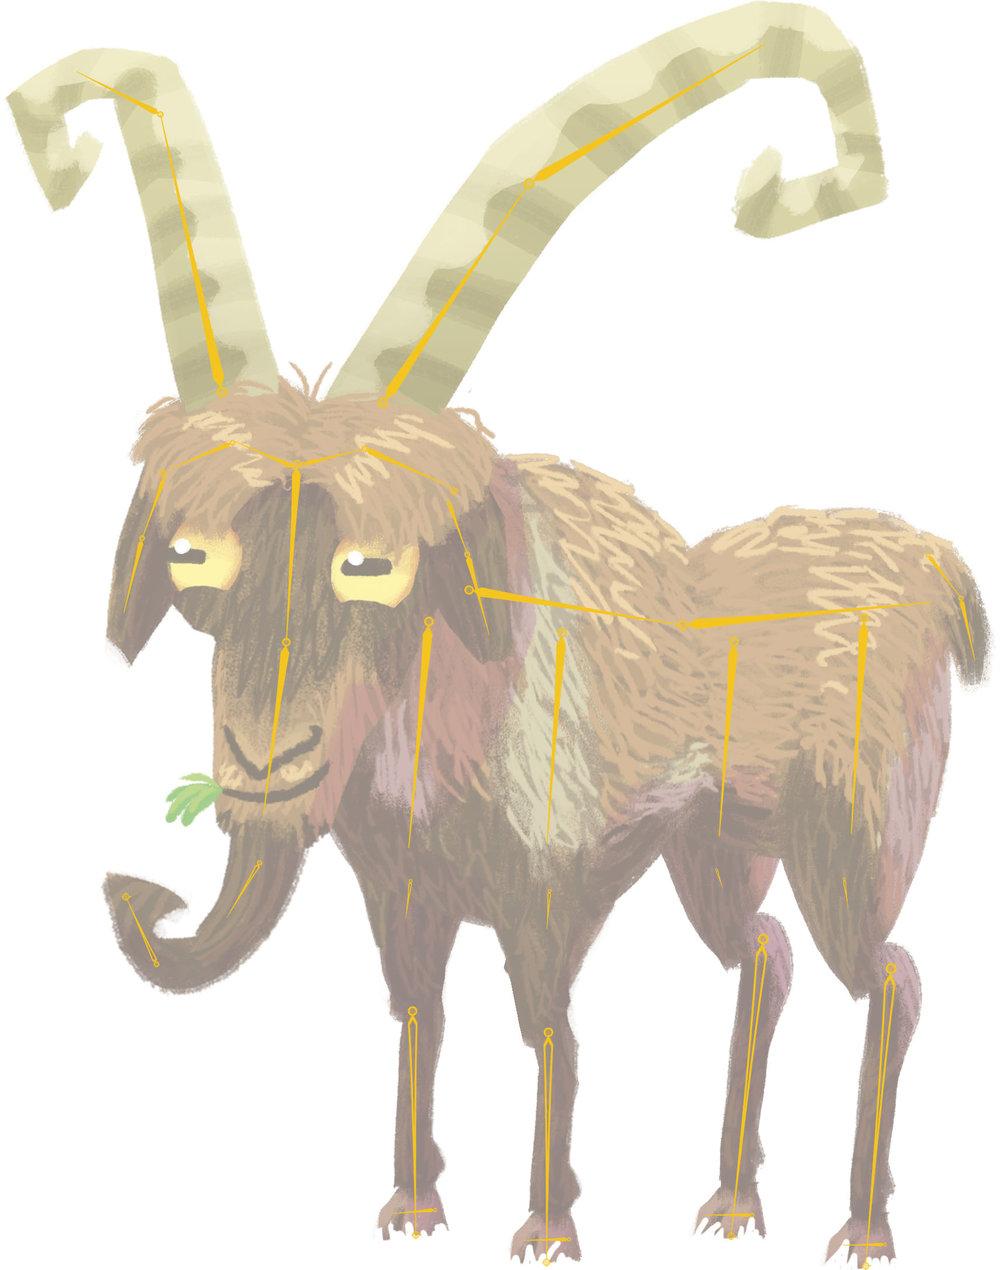 Goat bones images.jpg